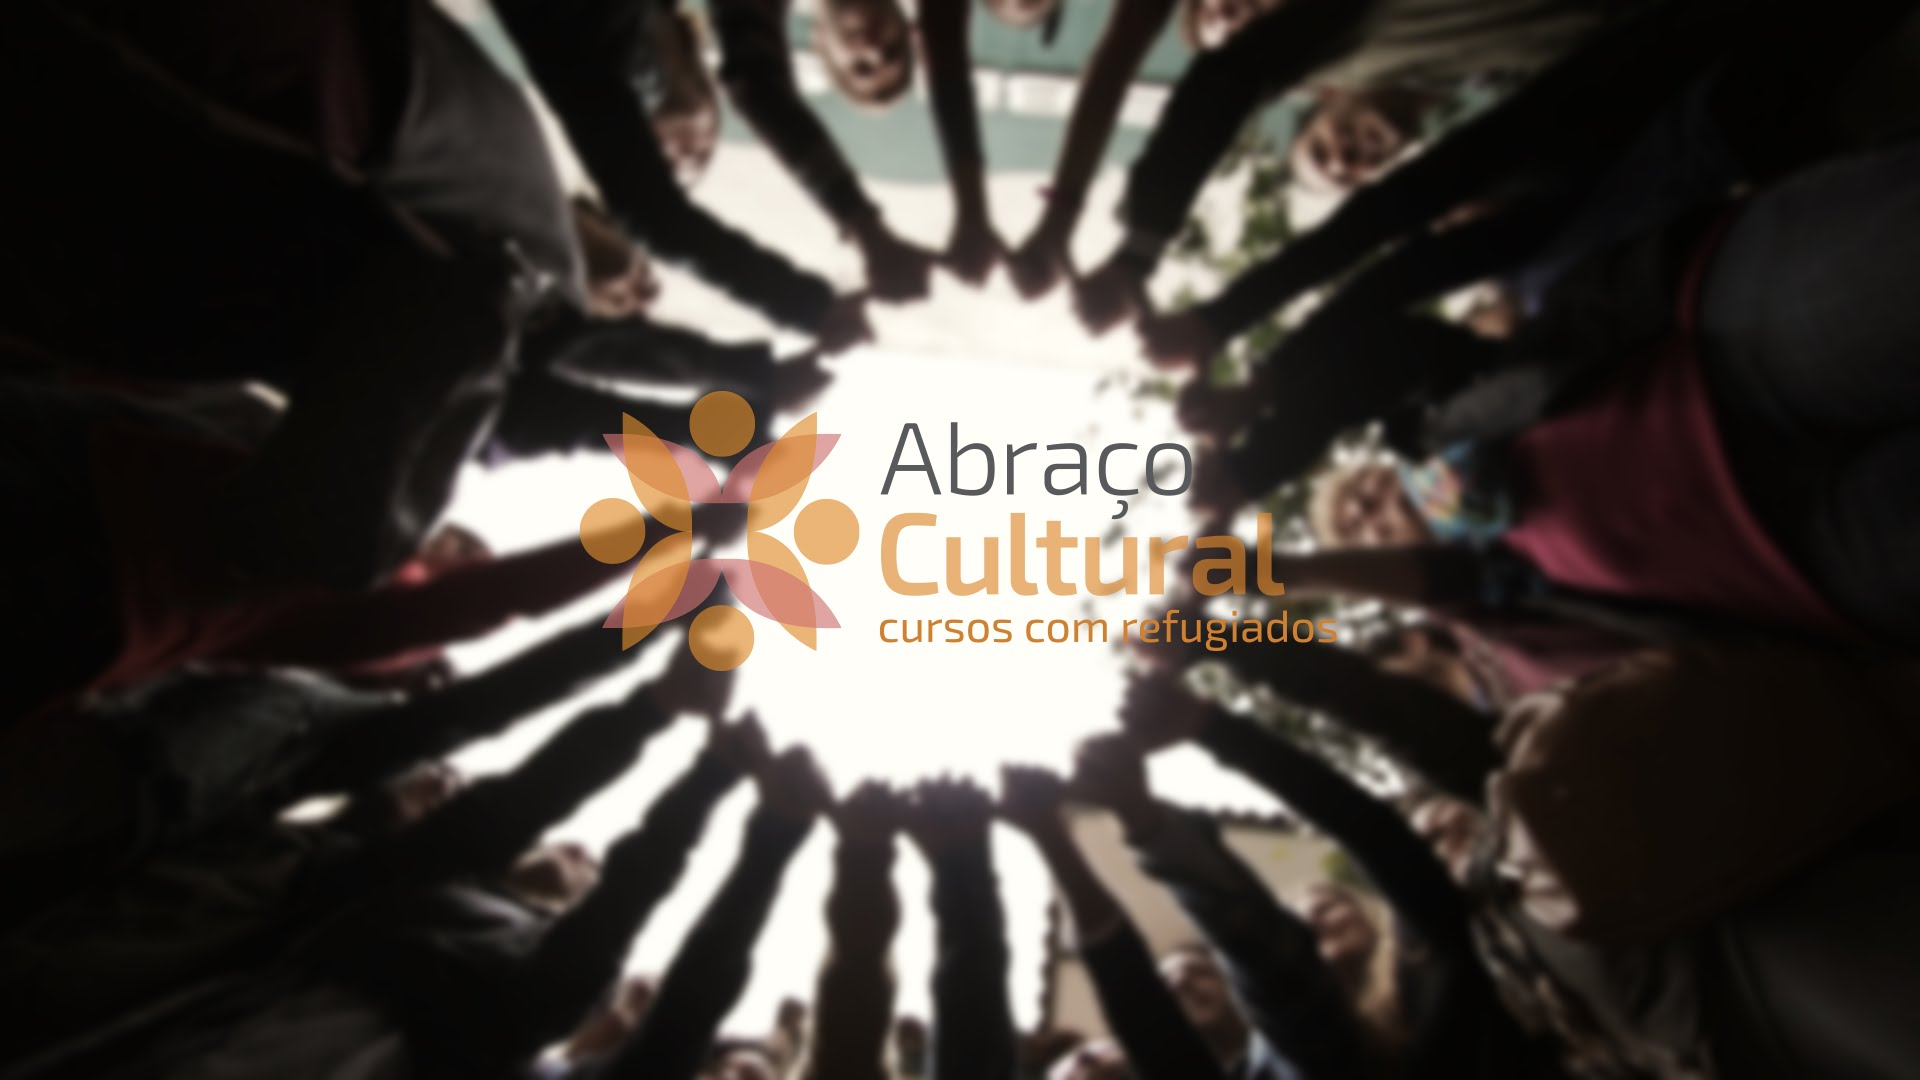 abraço cultural 1